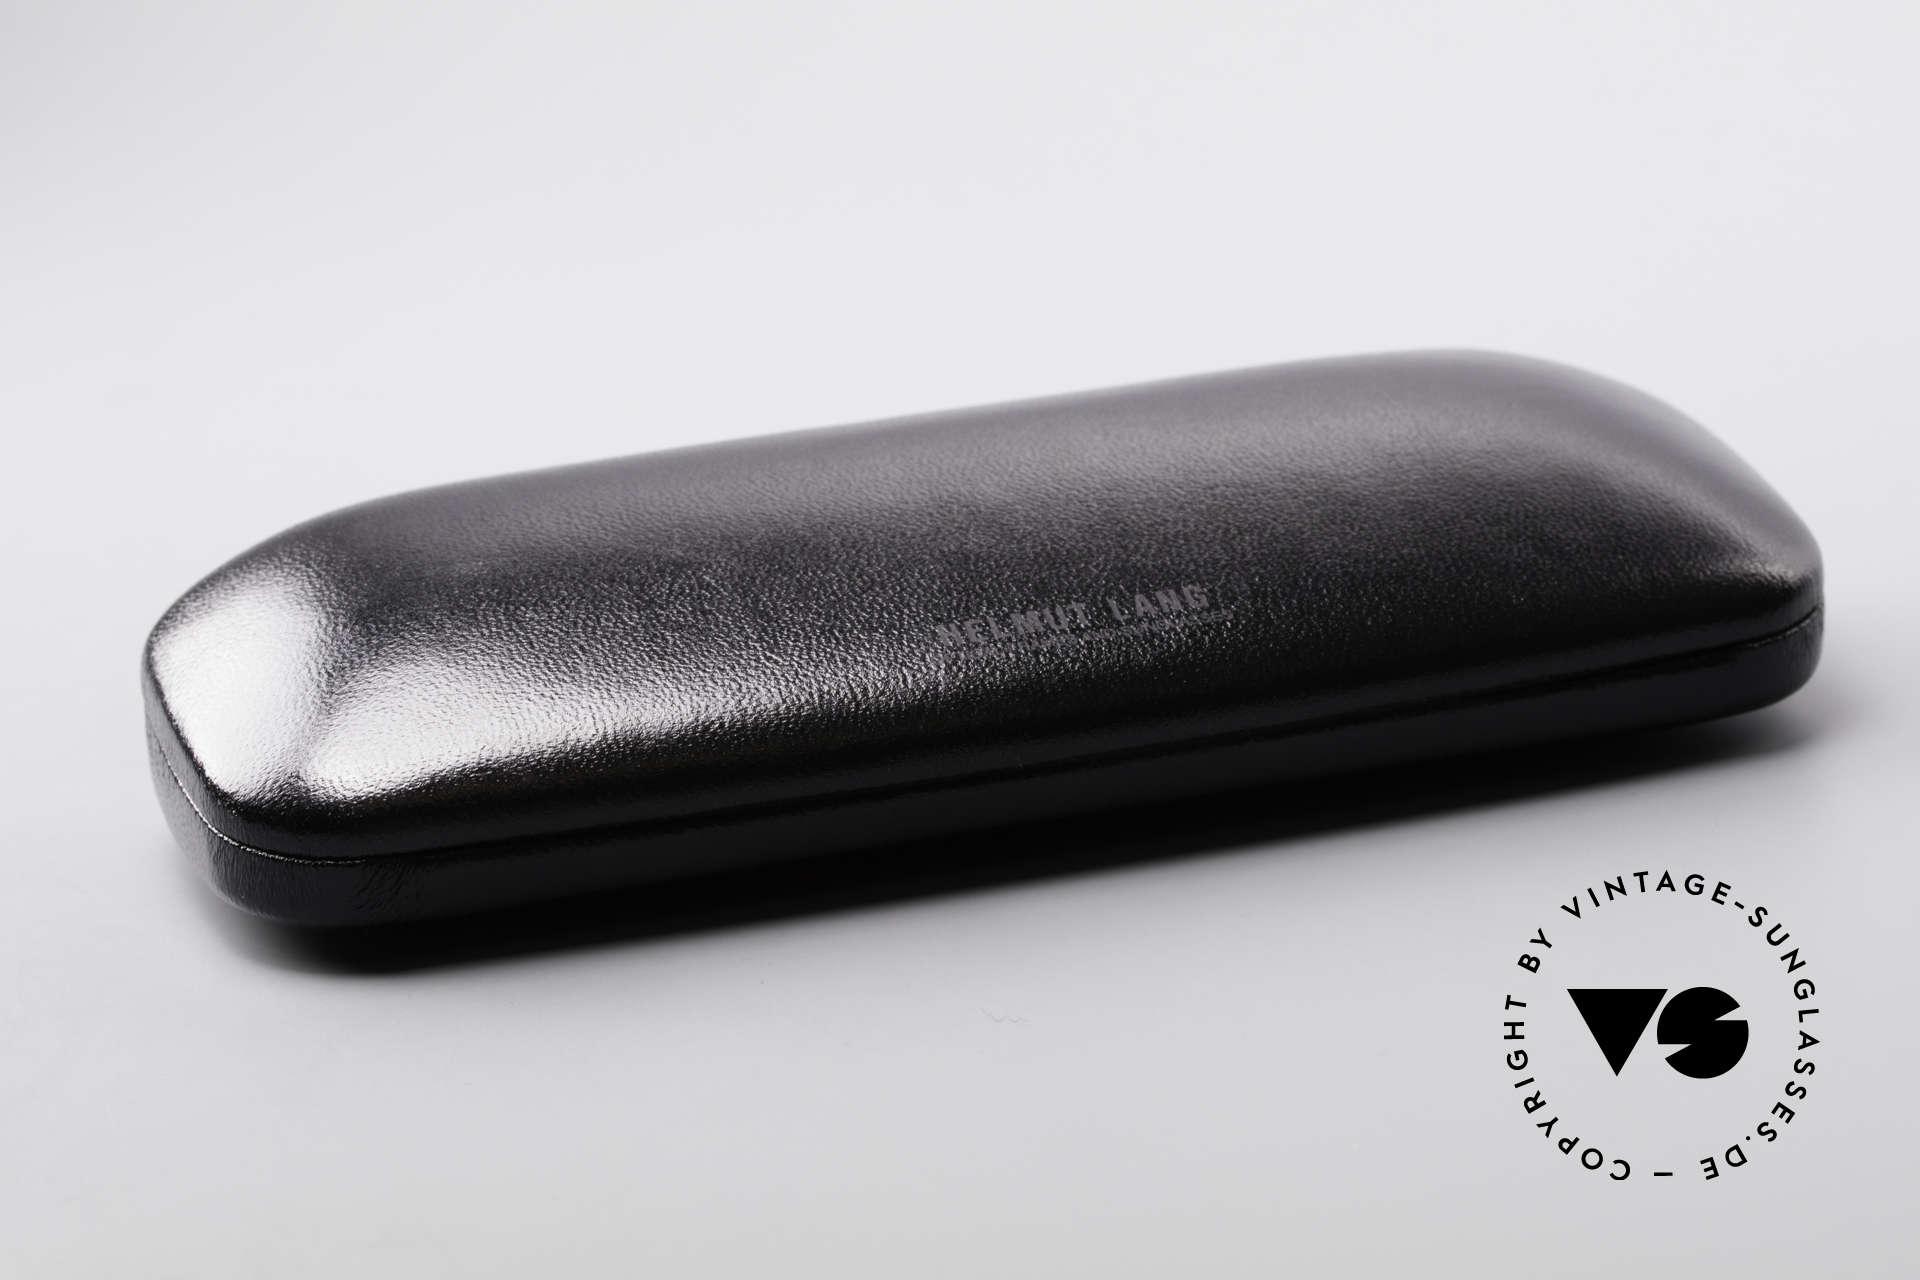 Helmut Lang SHL53A Minimalist Titanium Shades, Size: medium, Made for Men